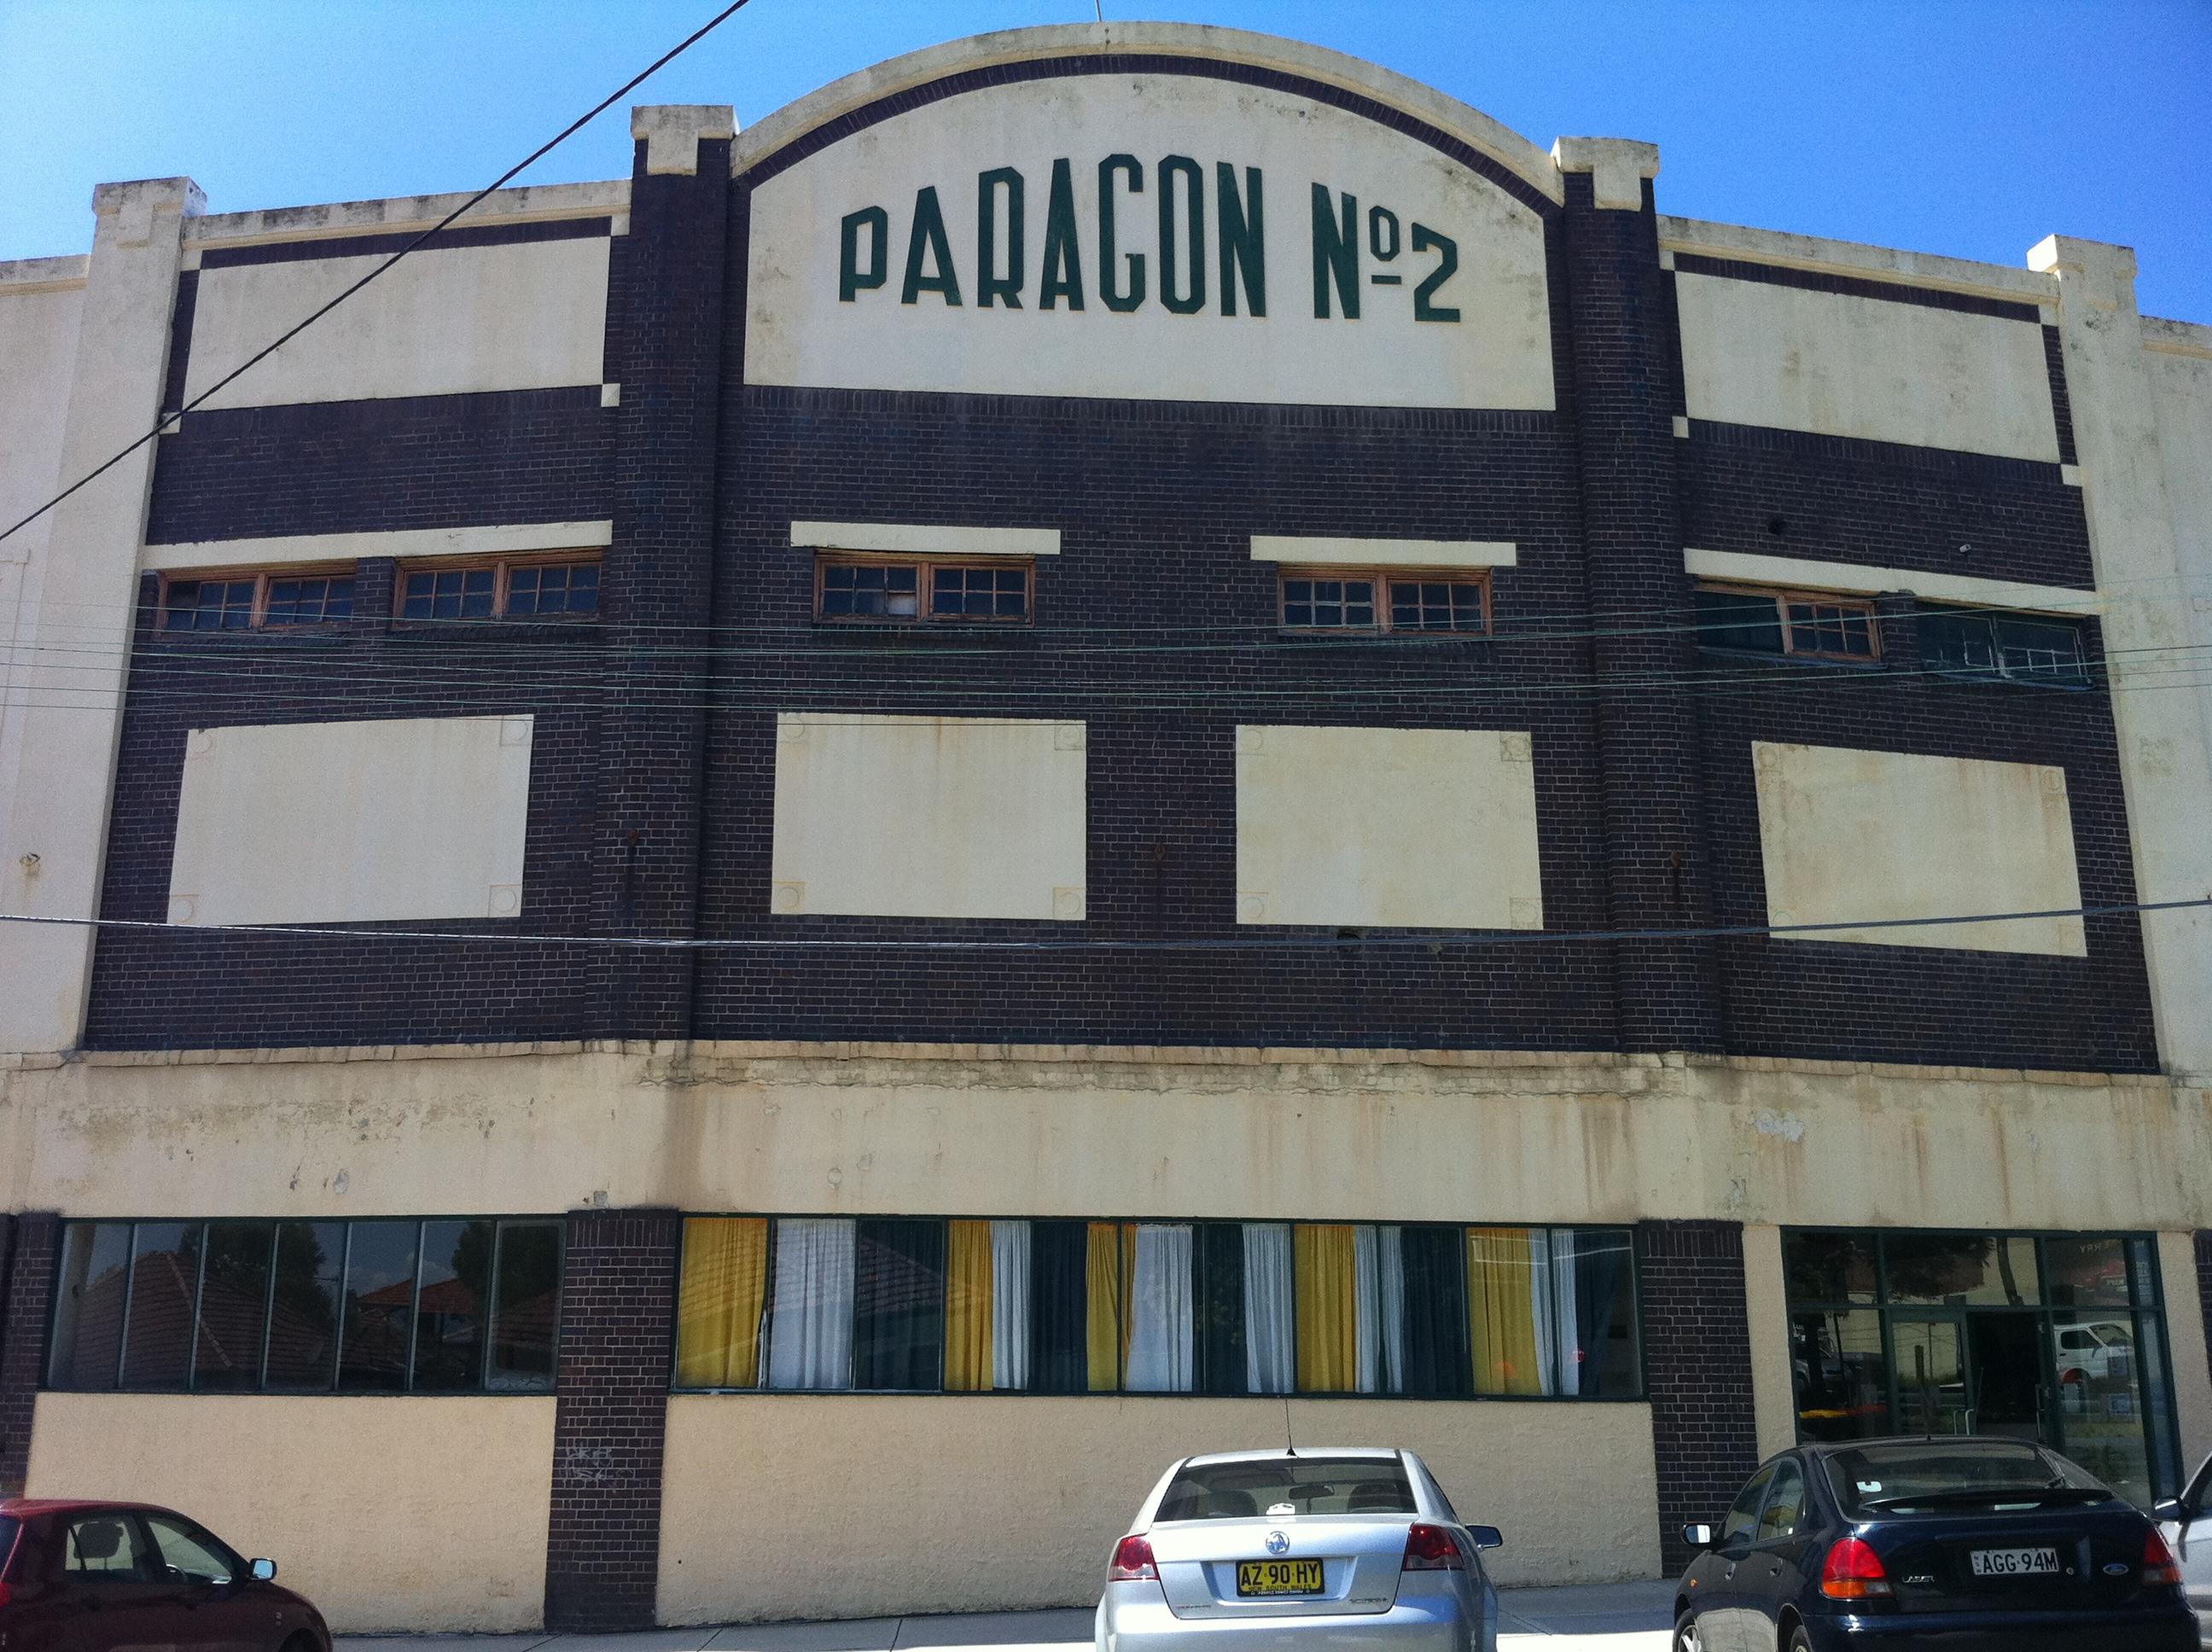 sydney based theatre companies in boston - photo#28